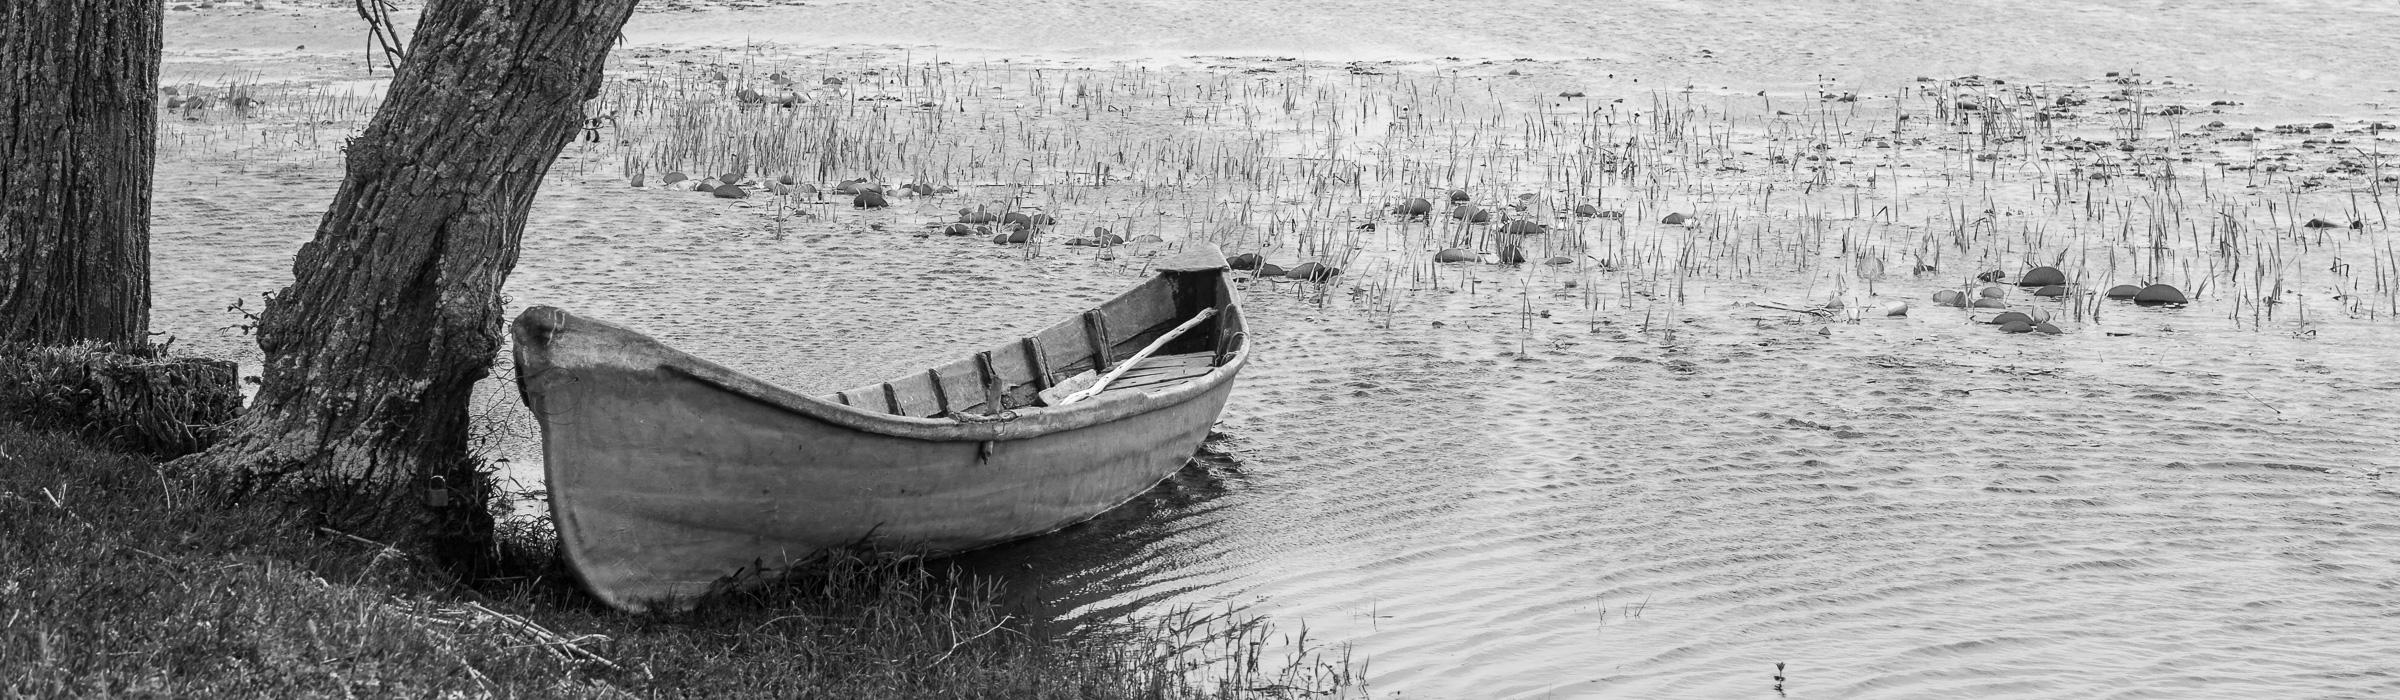 Boot im Donaudelta in Rumänien